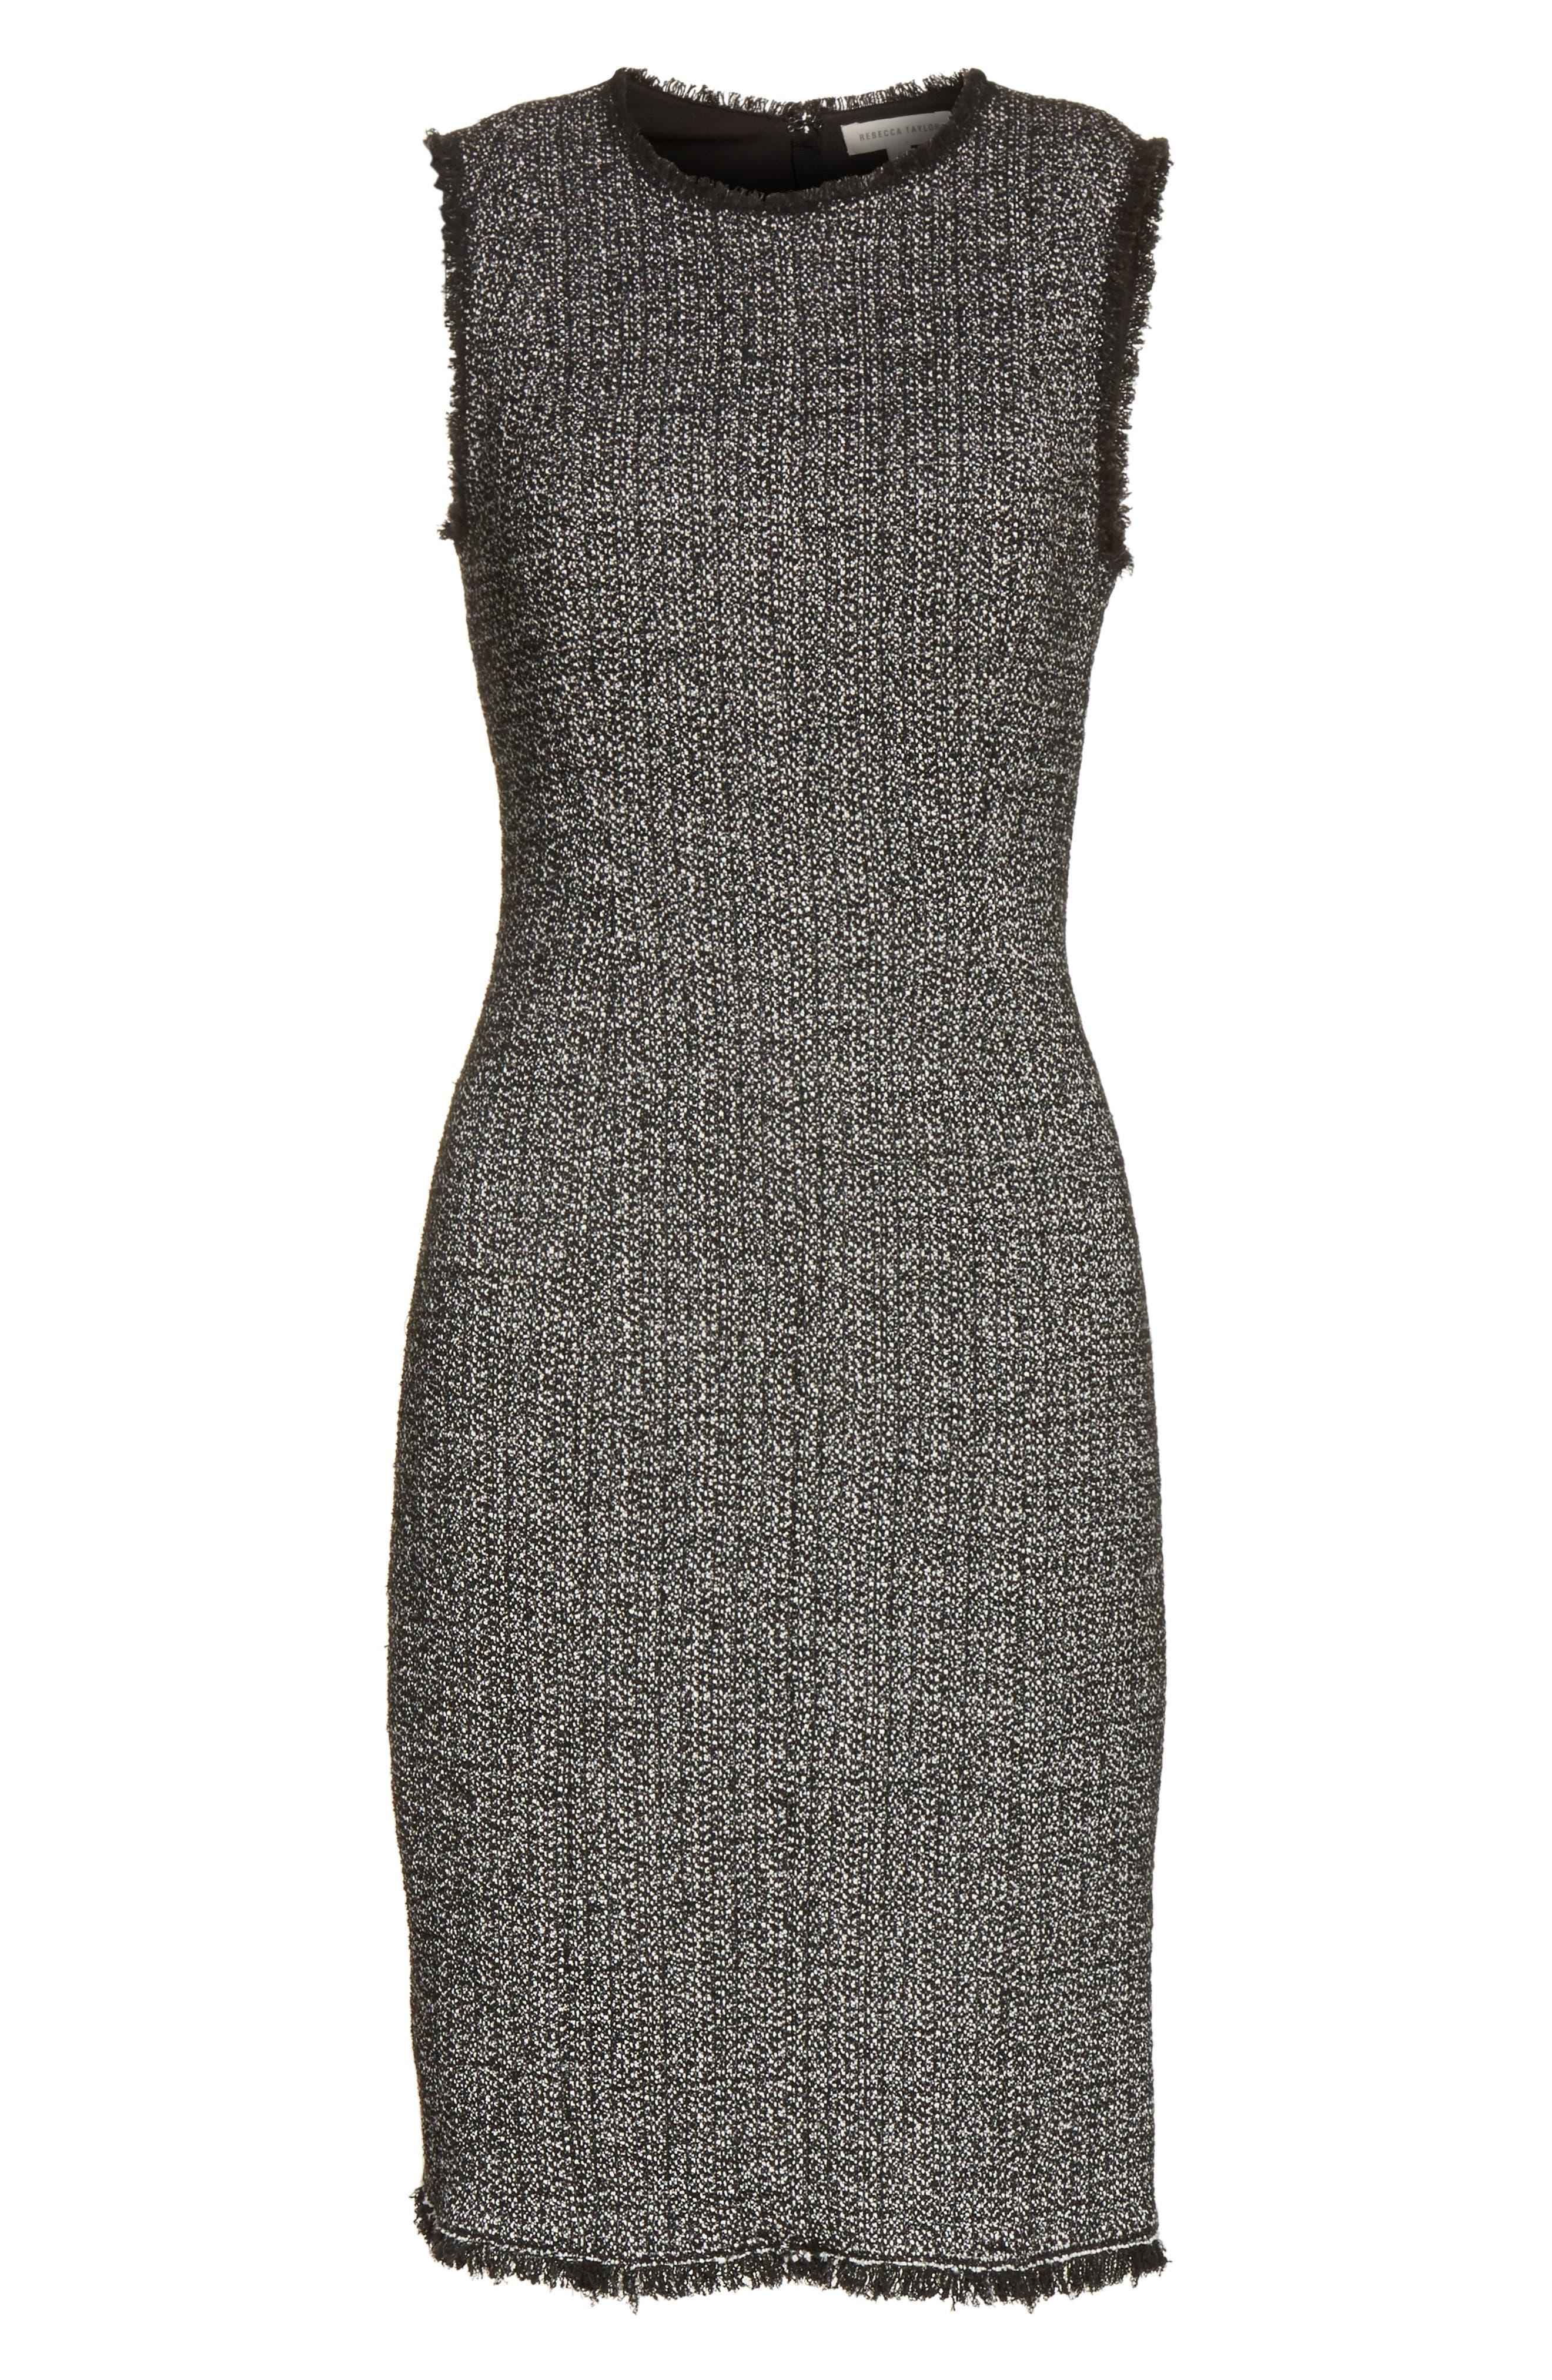 Tweed Sheath Dress,                             Alternate thumbnail 6, color,                             014